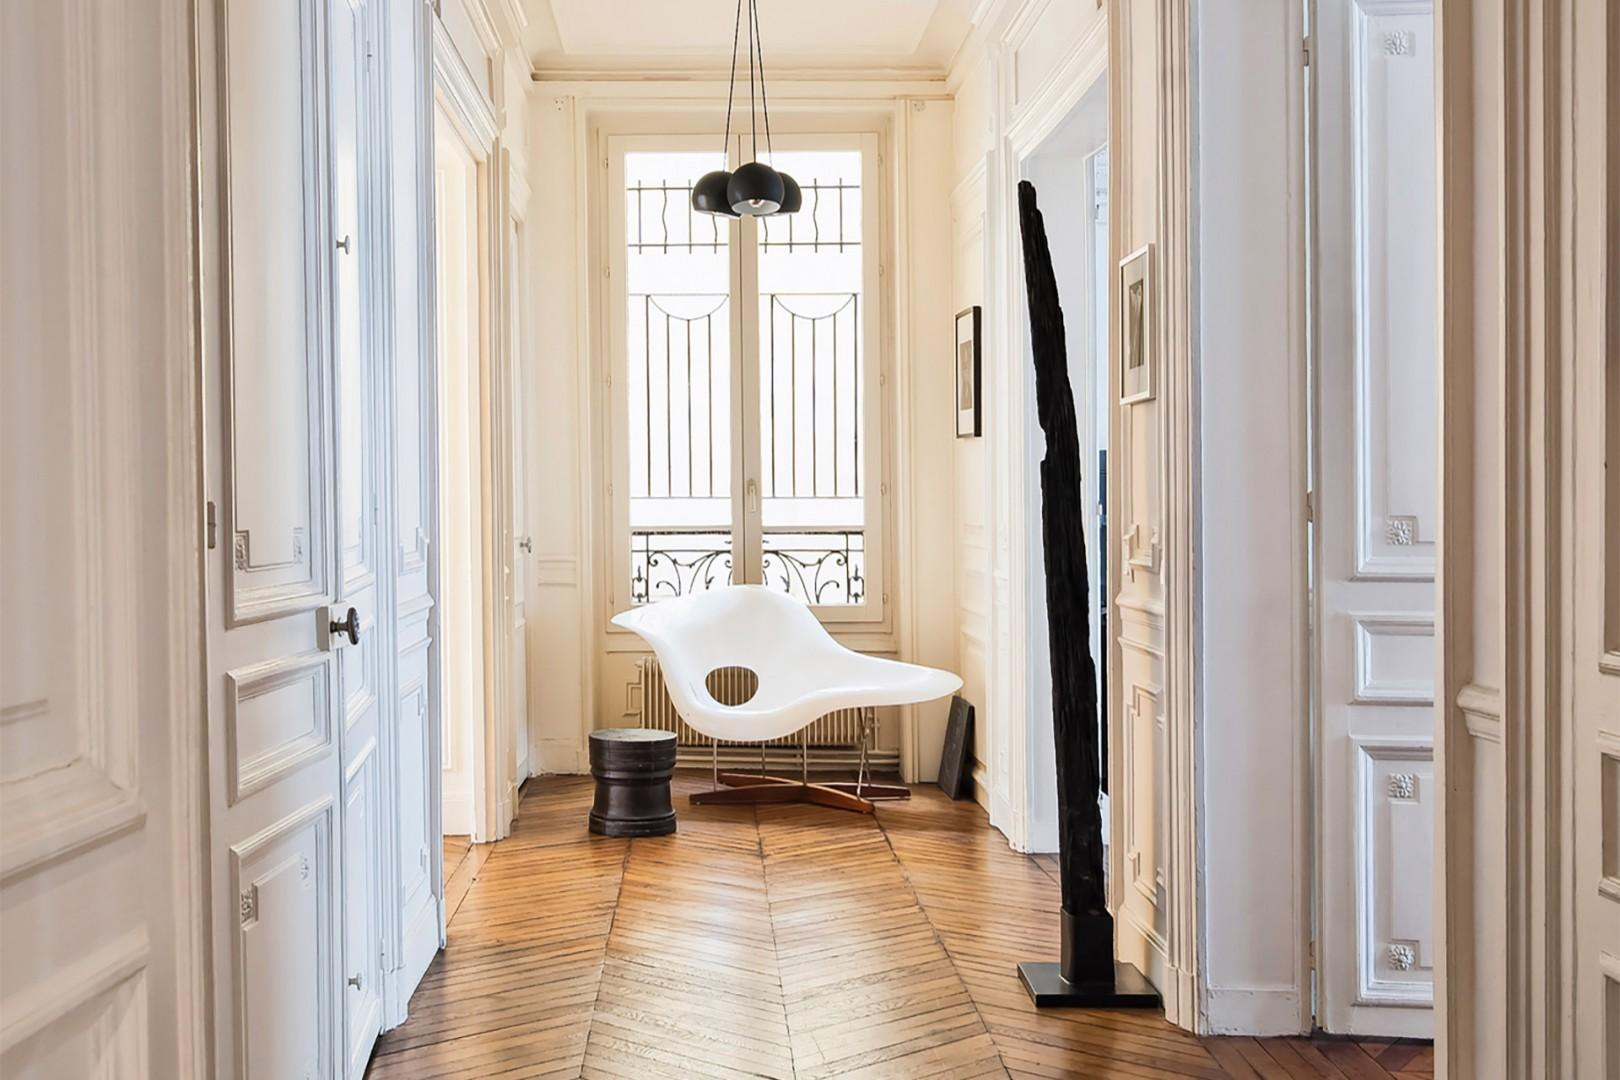 Enter through the elegant hallway.